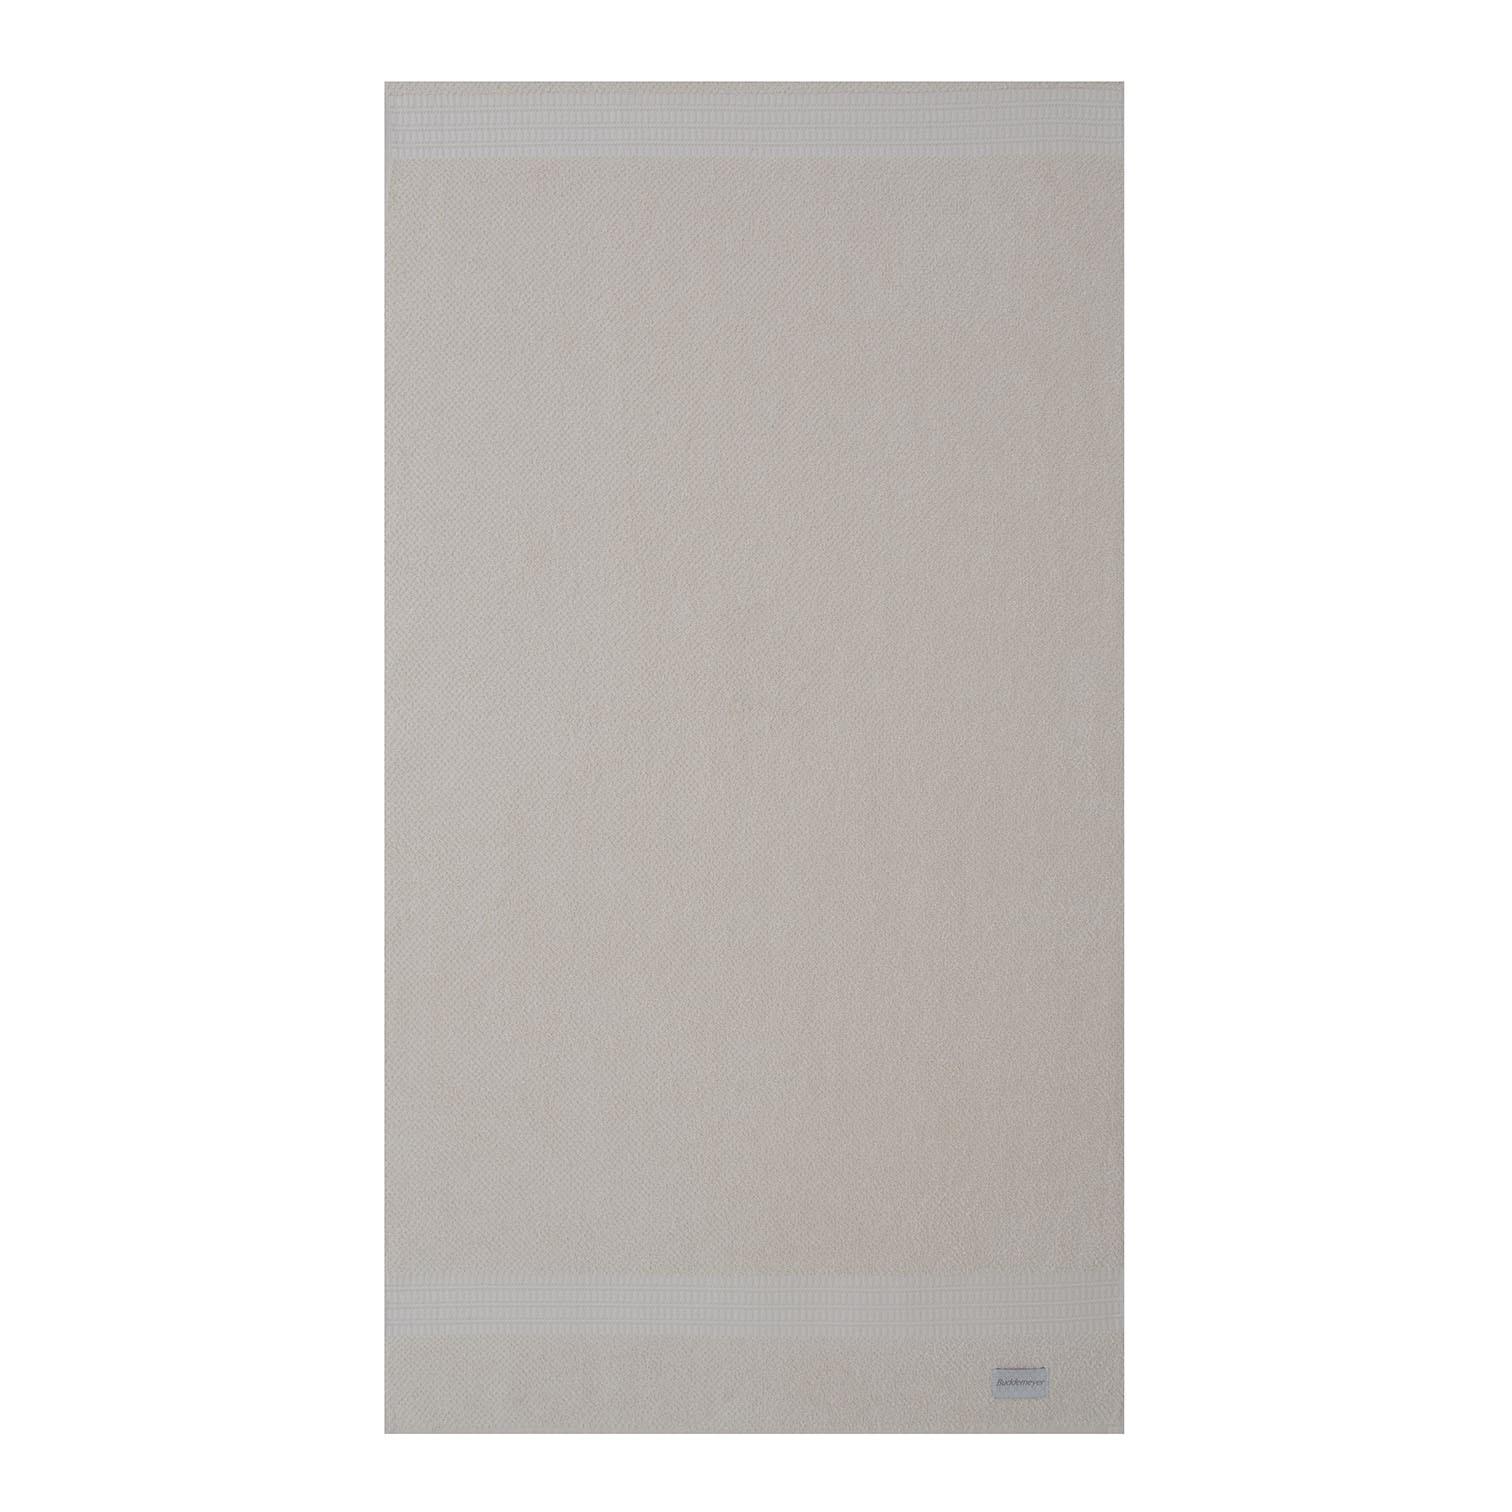 Toalha de Banho Frape 100 Algodao 70 x 135 cm Bege - Buddemeyer